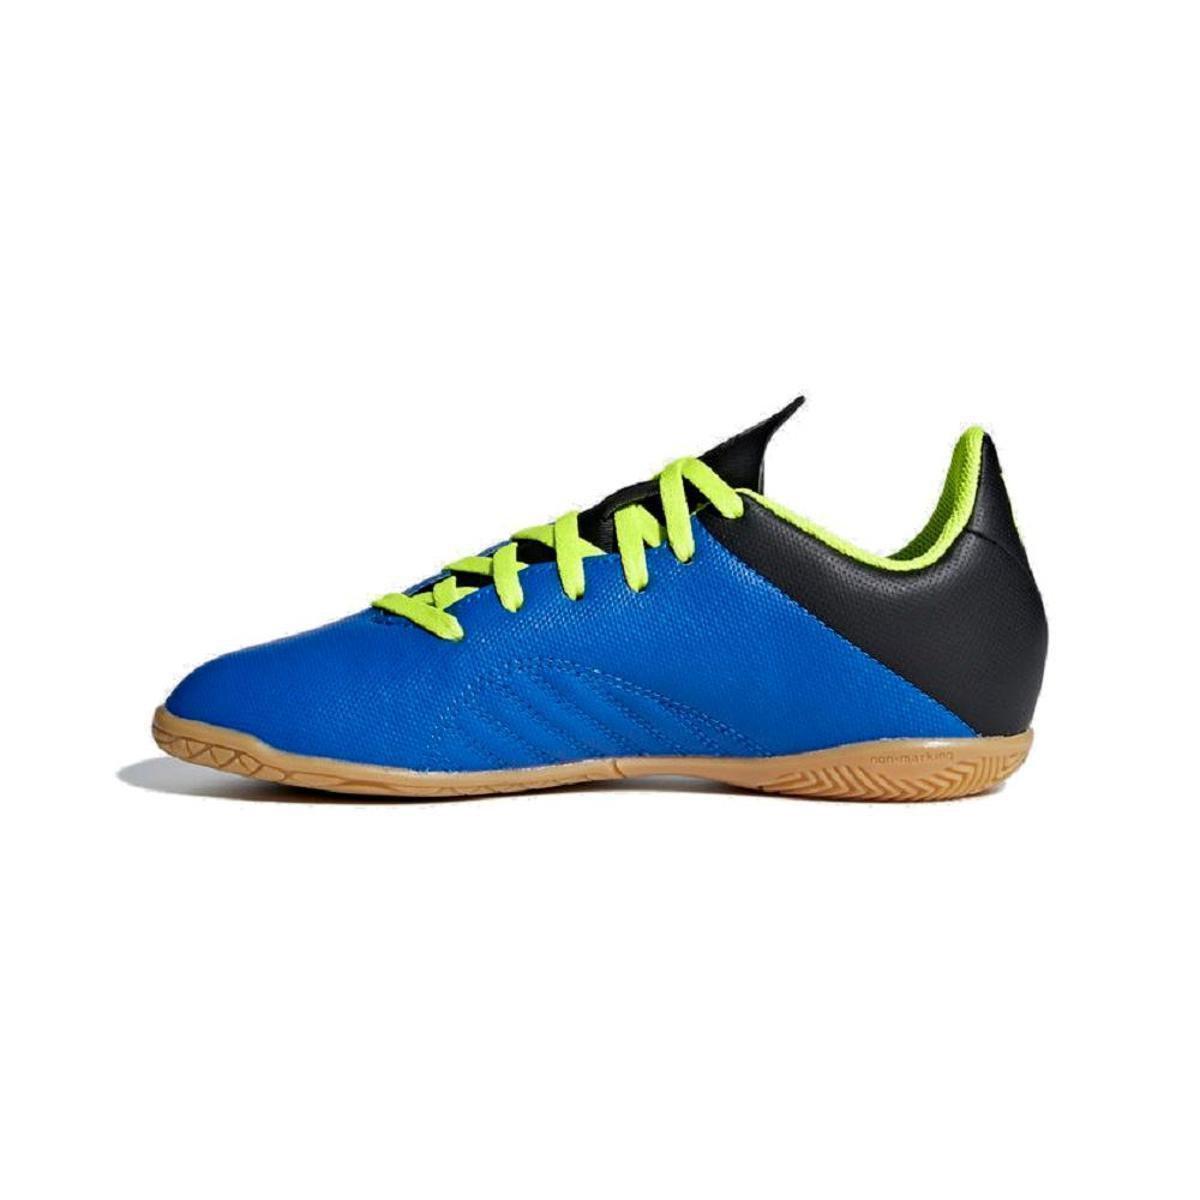 ... factory authentic Chuteira Futsal Infantil Adidas X Tango 18 4 In -  Azul e amarelo . ... 6bbbc7a3805b5